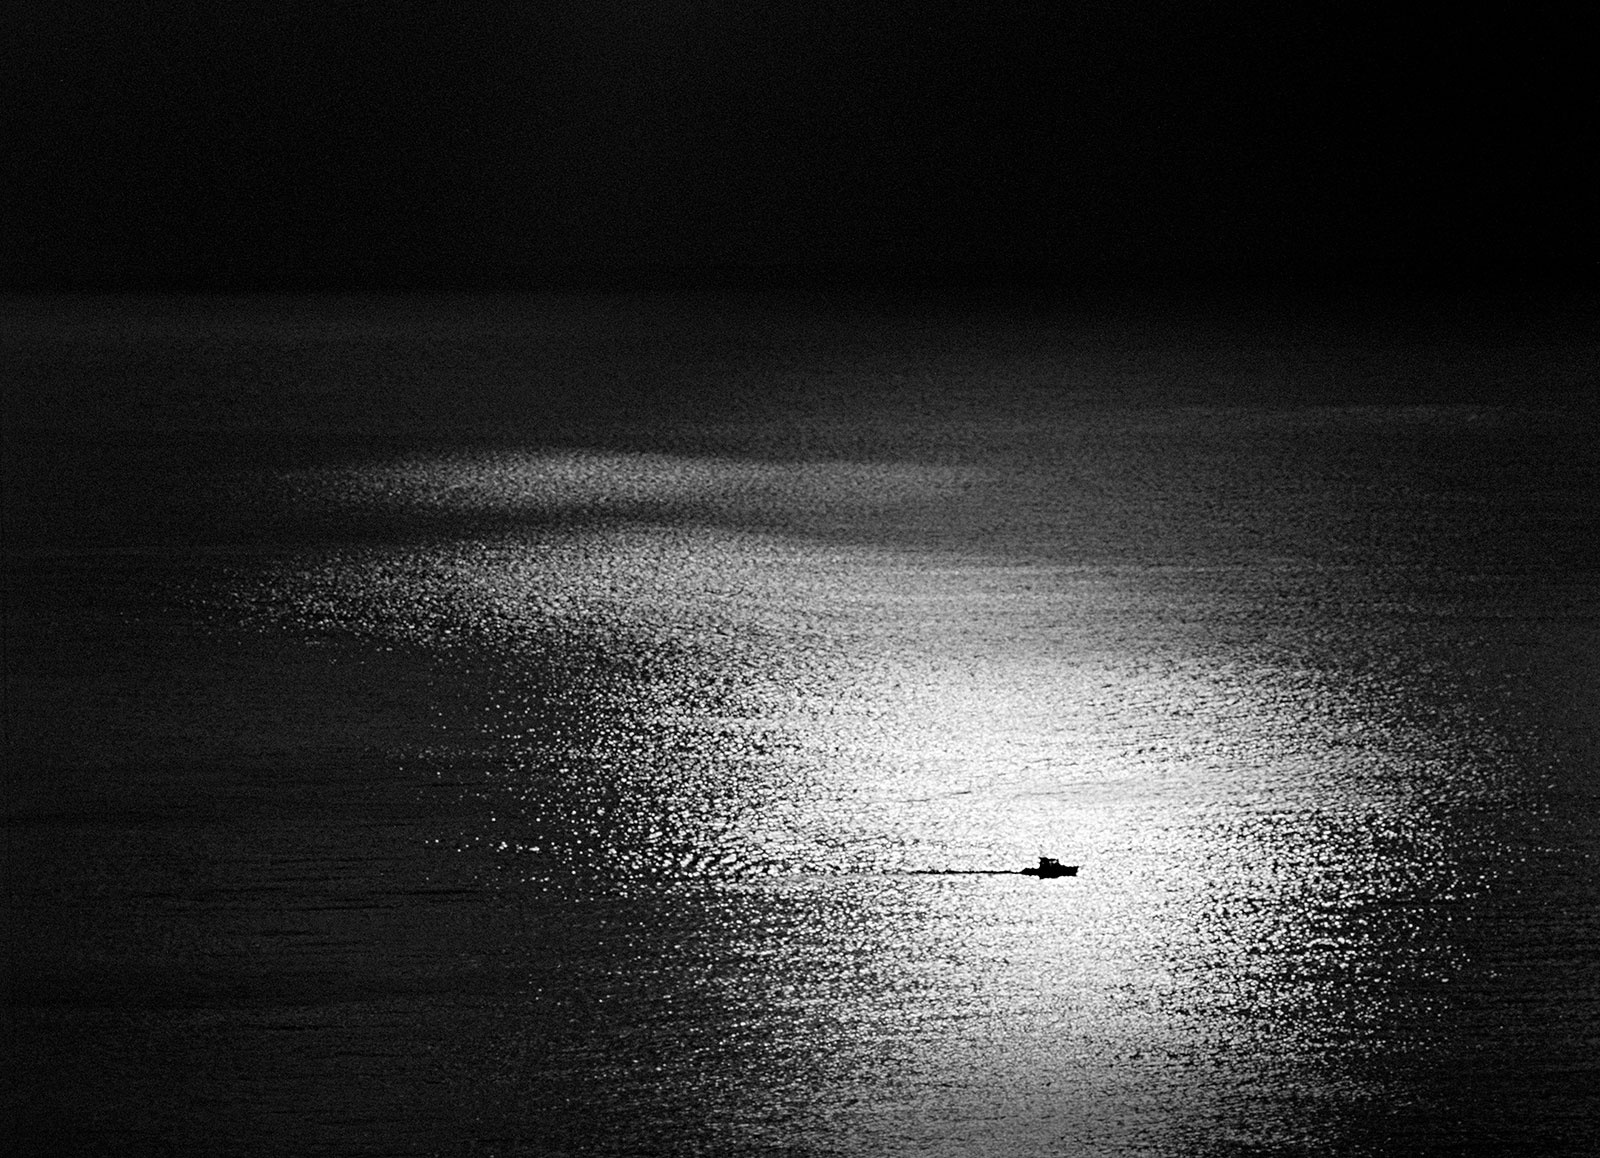 When lights are low by Marek Fogiel